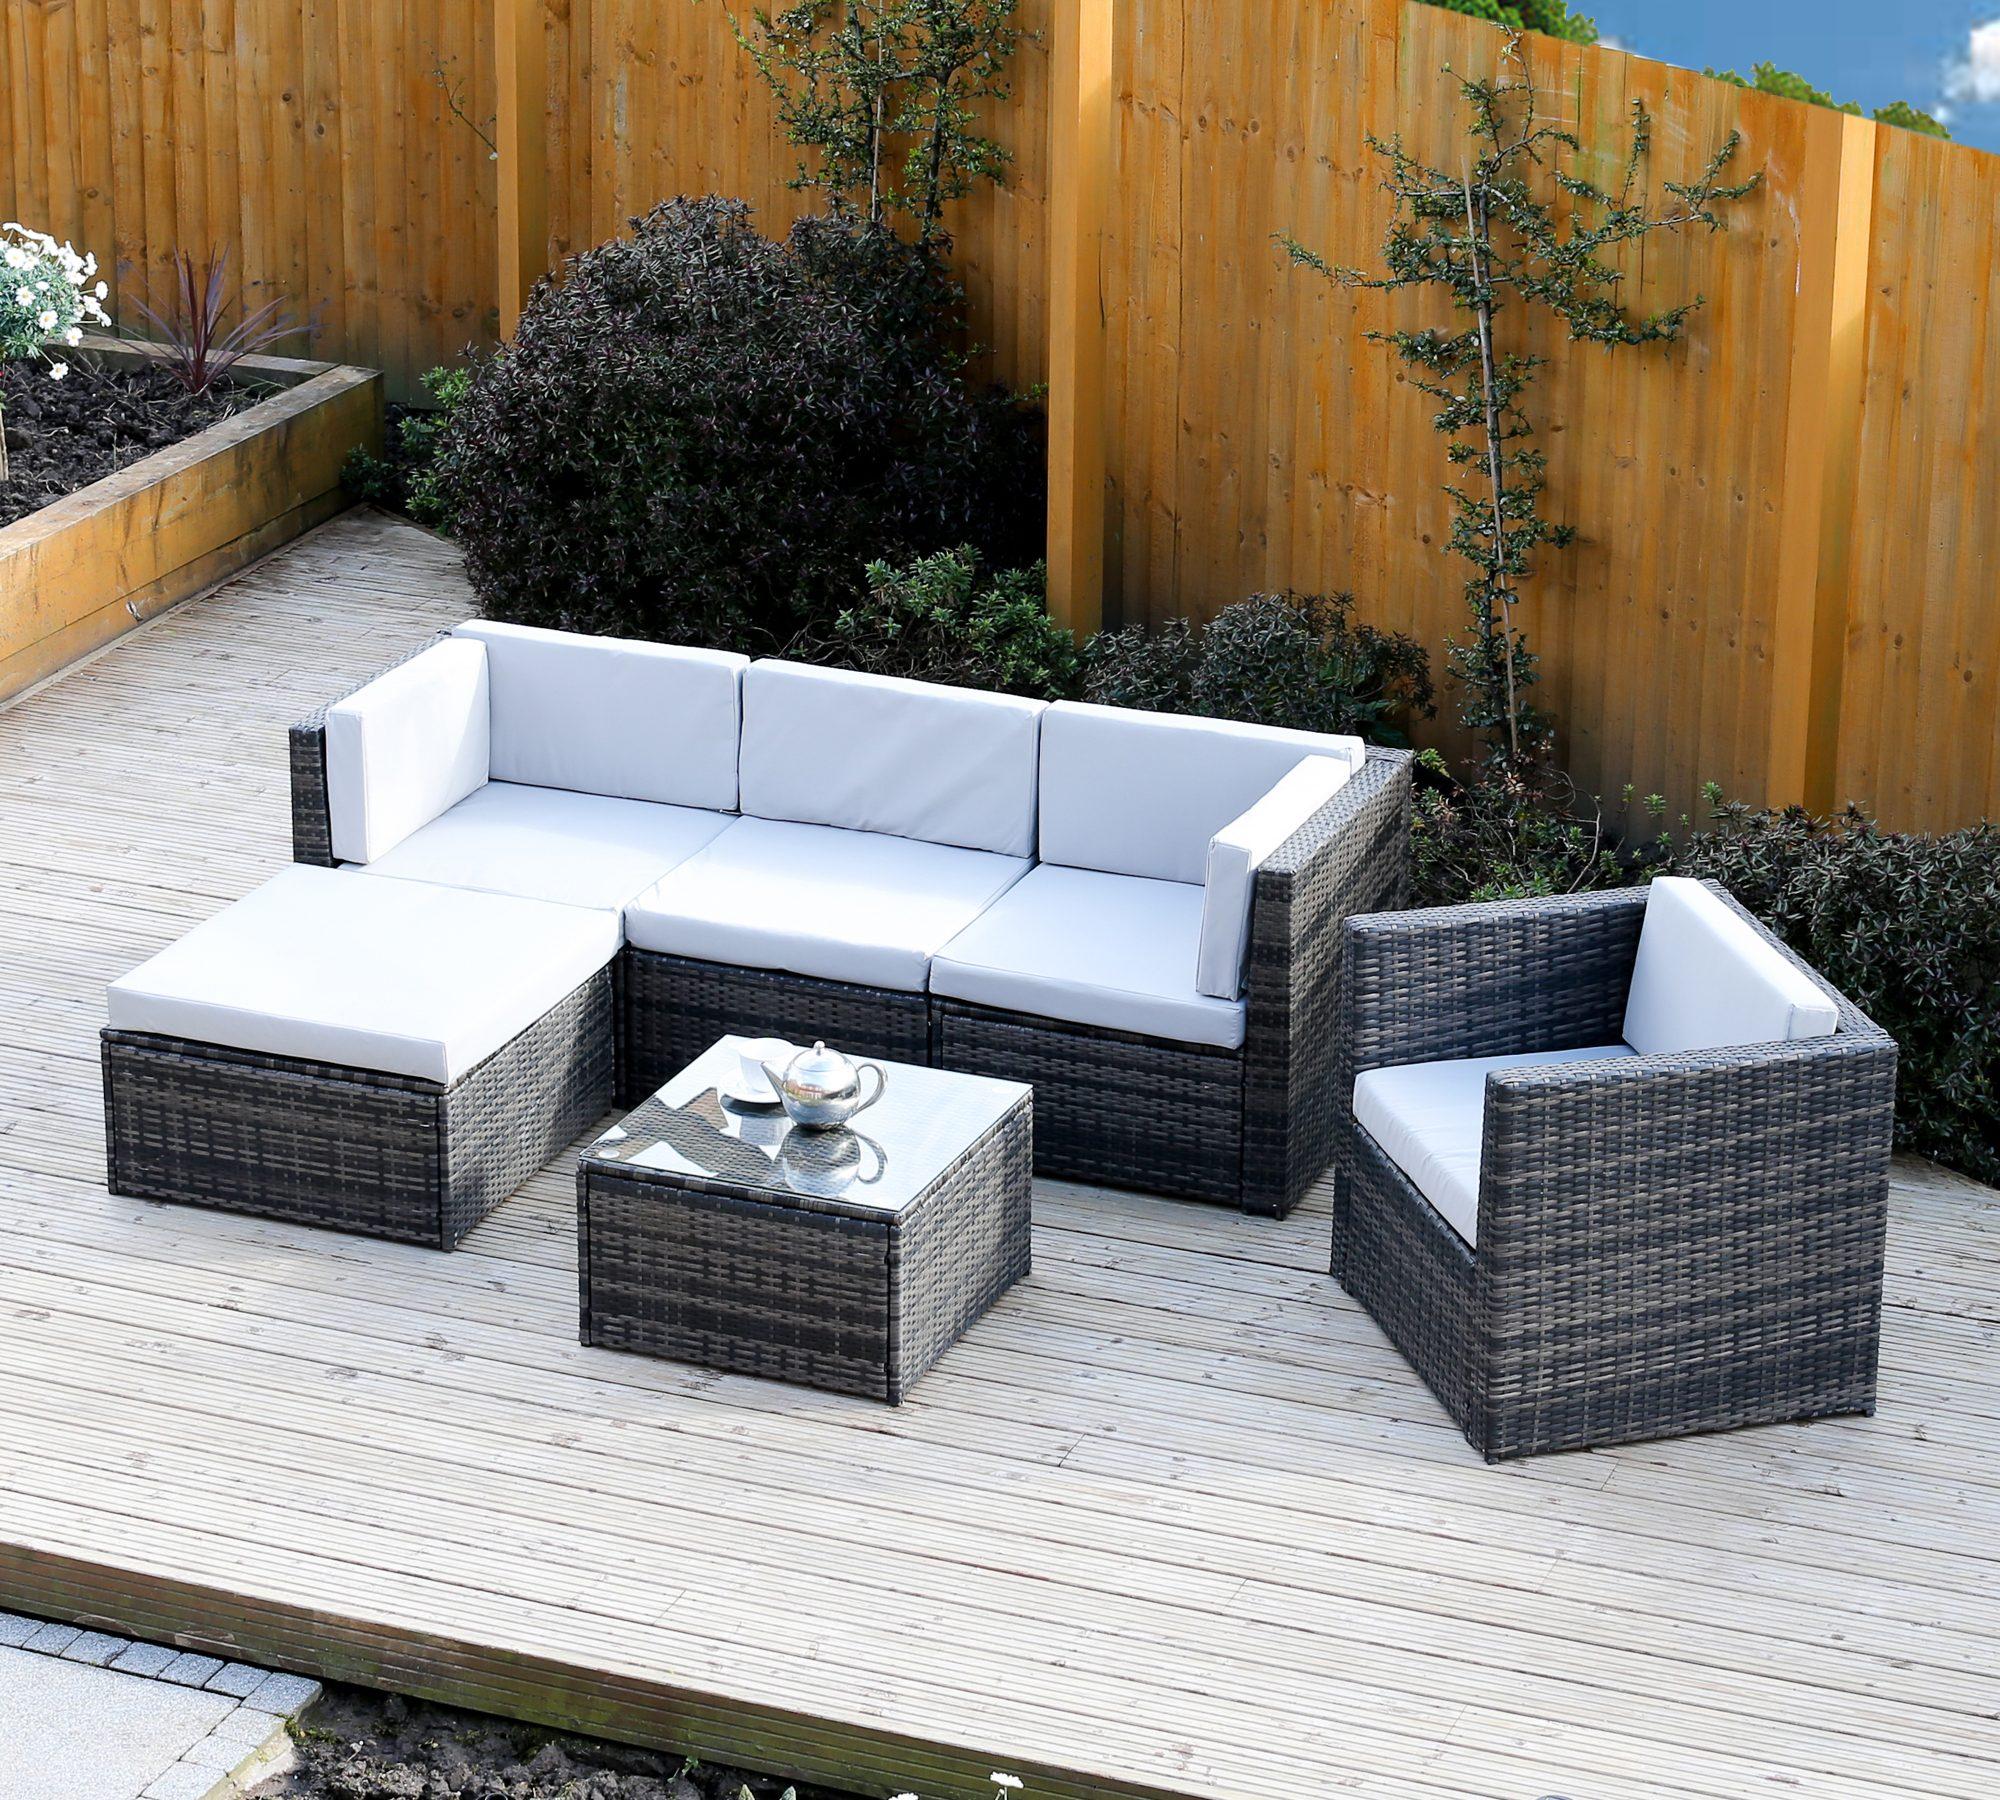 Rattan Corner Sofa Abreo: The Rattan Garden Furniture Blog